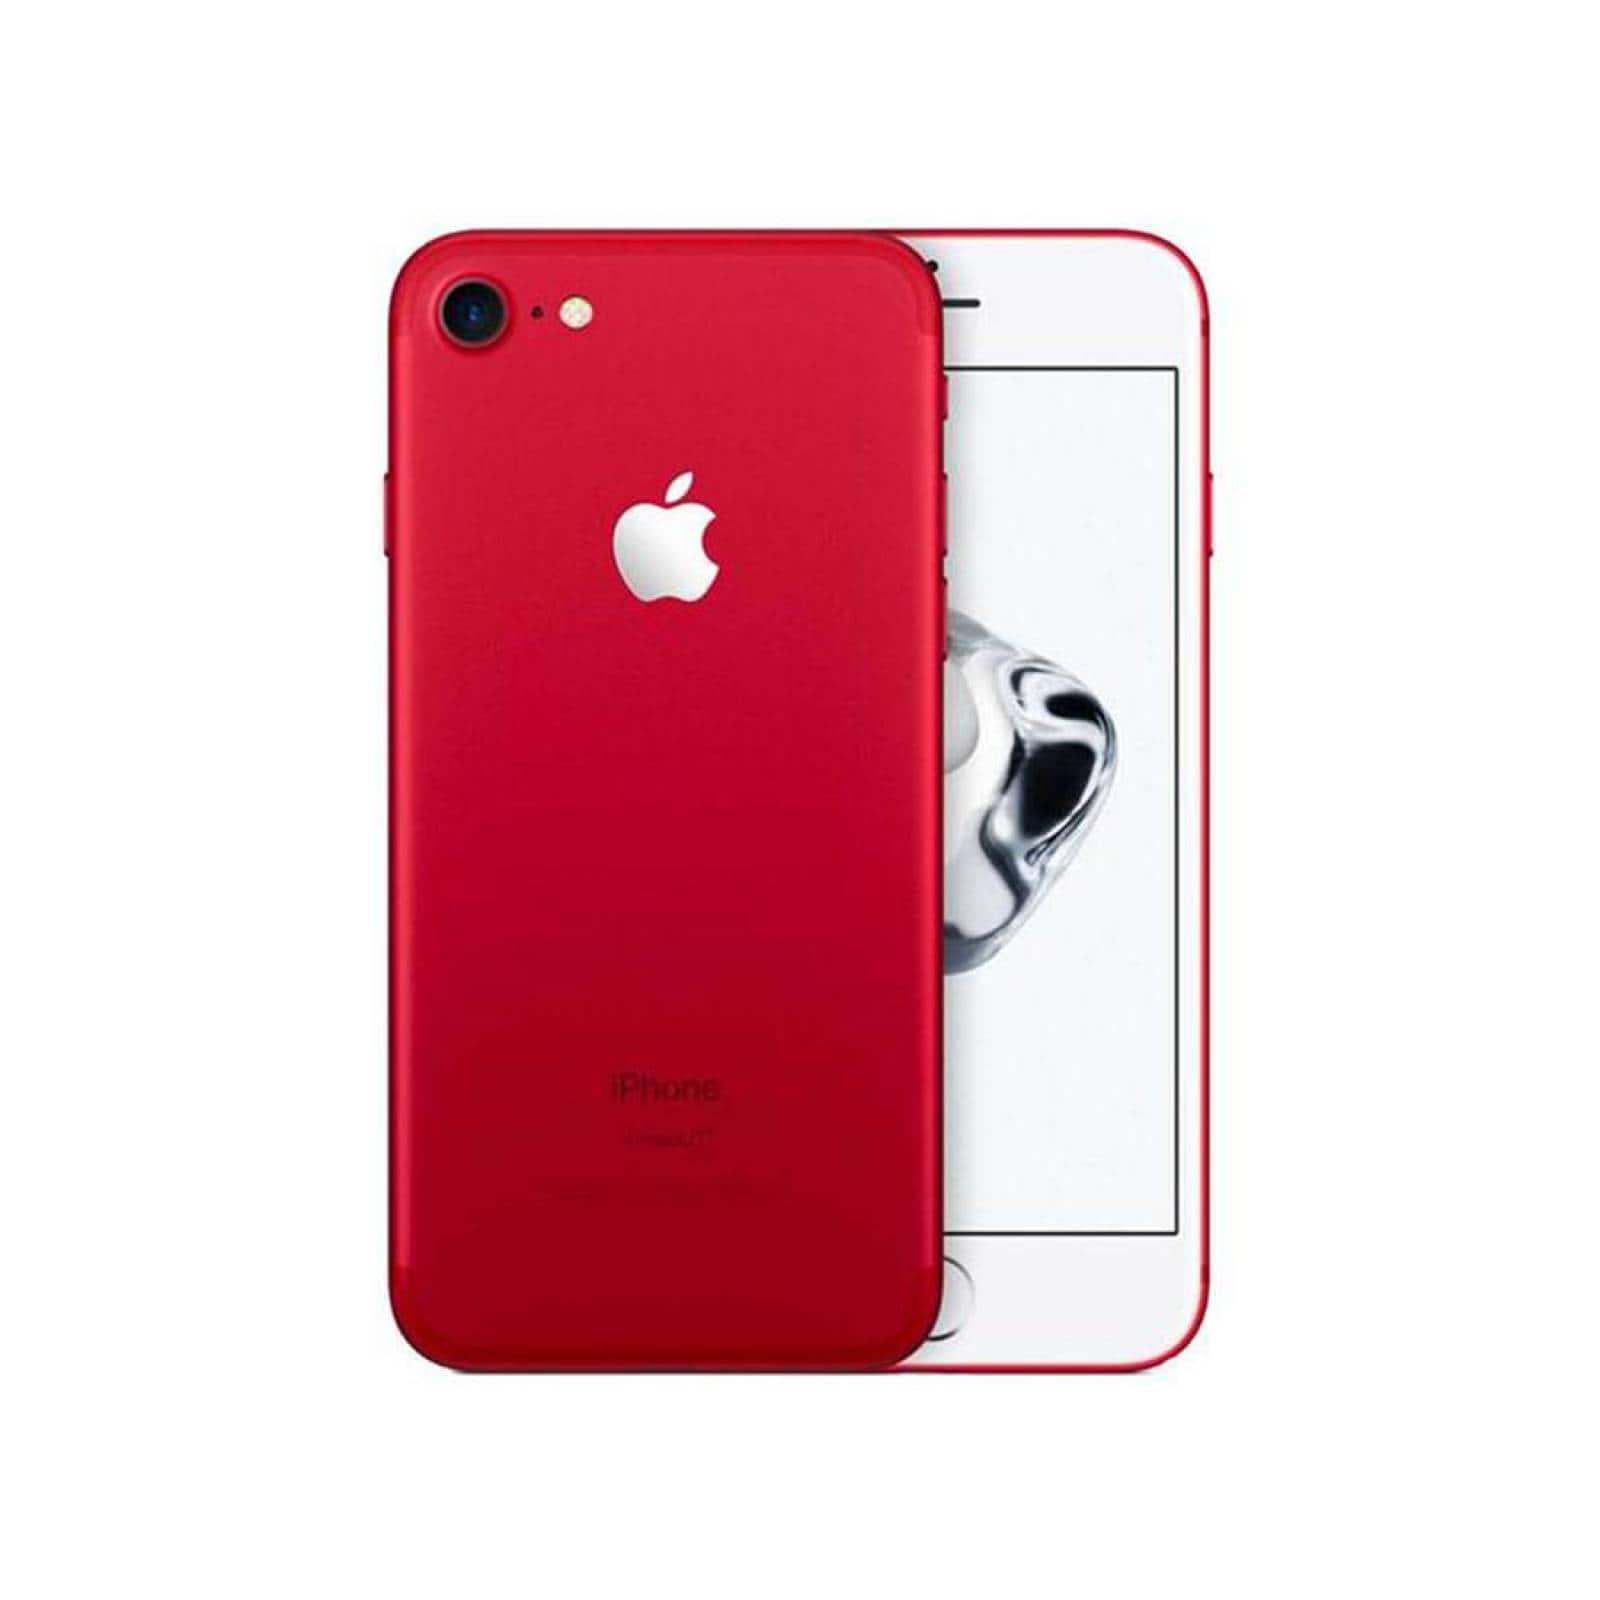 Celular IPhone 7 256GB Reacondicionado por Apple